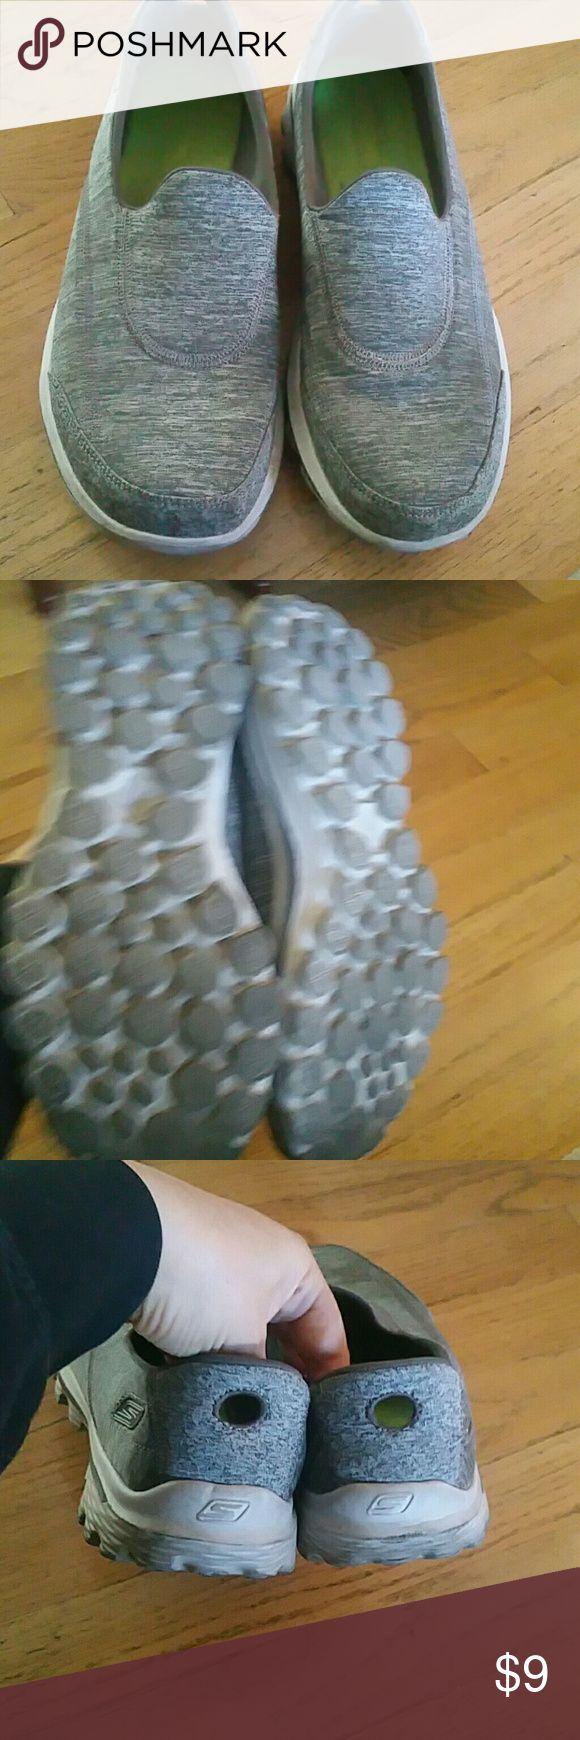 Sketcher sneakers, so comfy!!! Super cute slip on grey sneakers! sketchers Shoes Sneakers